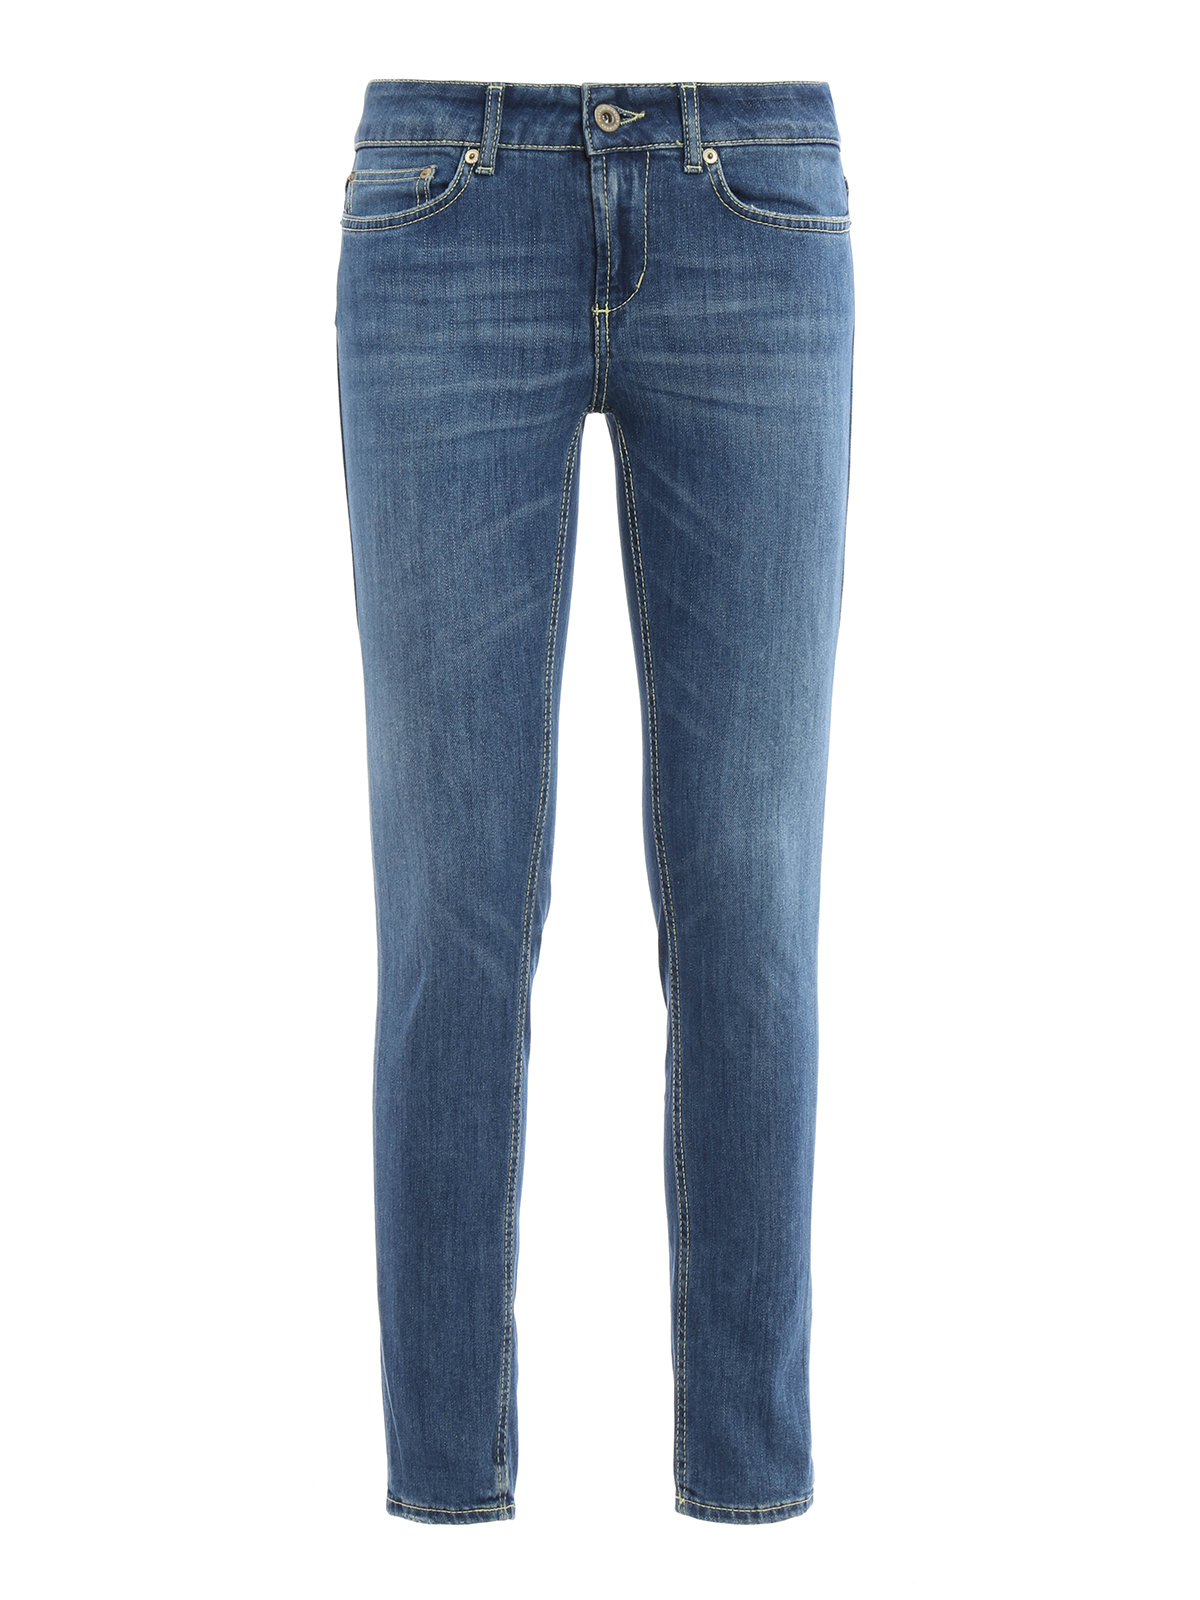 monroe low waist jeans by dondup skinny jeans shop online at p692 ds146d o46 800. Black Bedroom Furniture Sets. Home Design Ideas